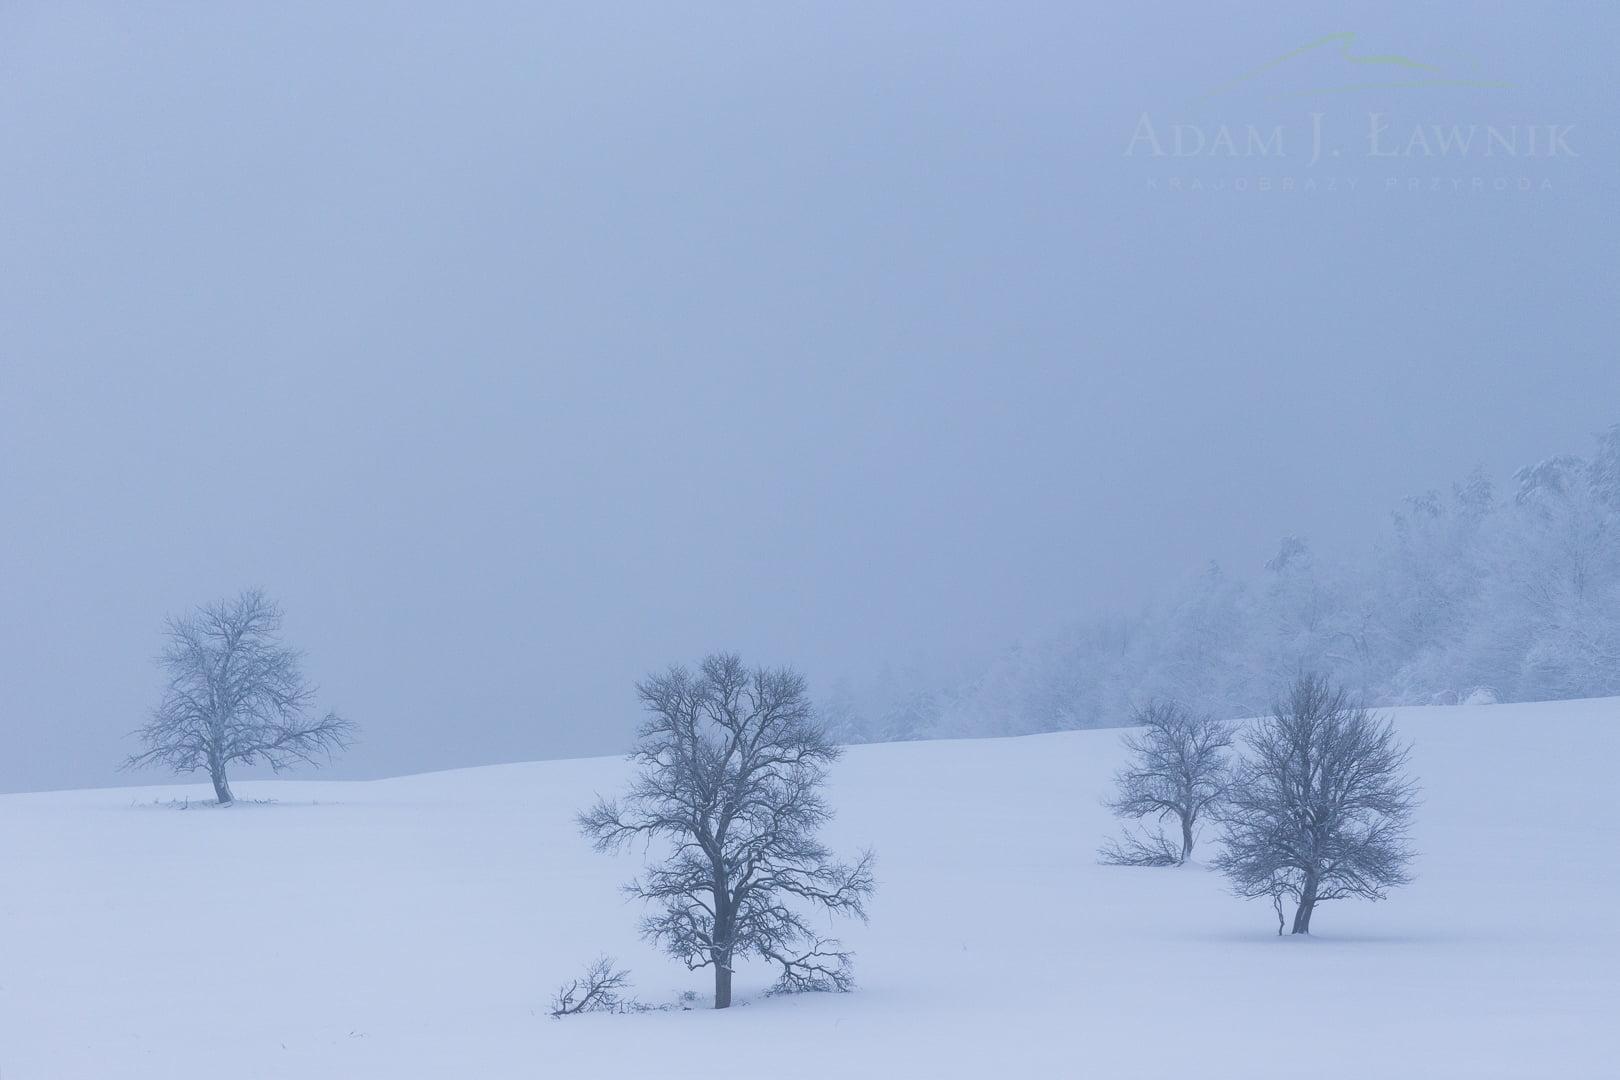 Magura National Park, Poland 1701-00111C